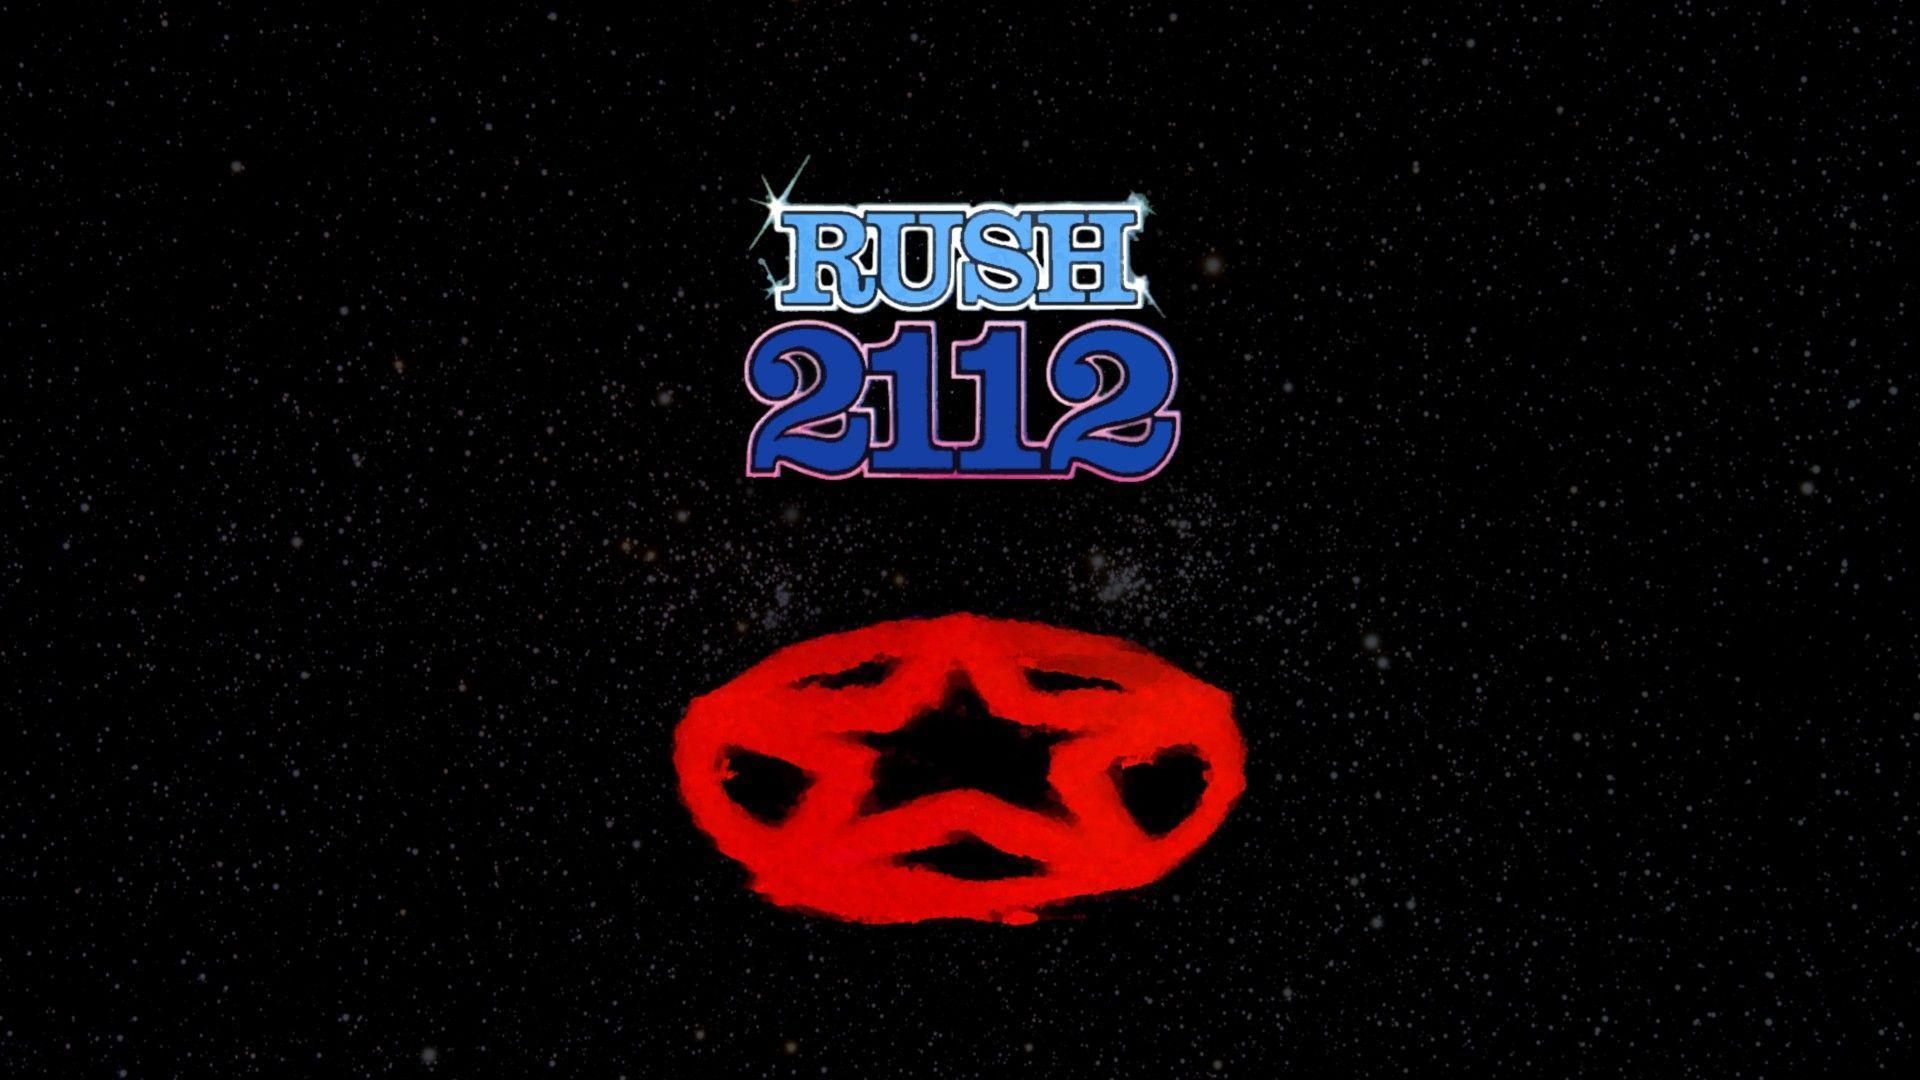 Rush Band Wallpapers 1920x1080